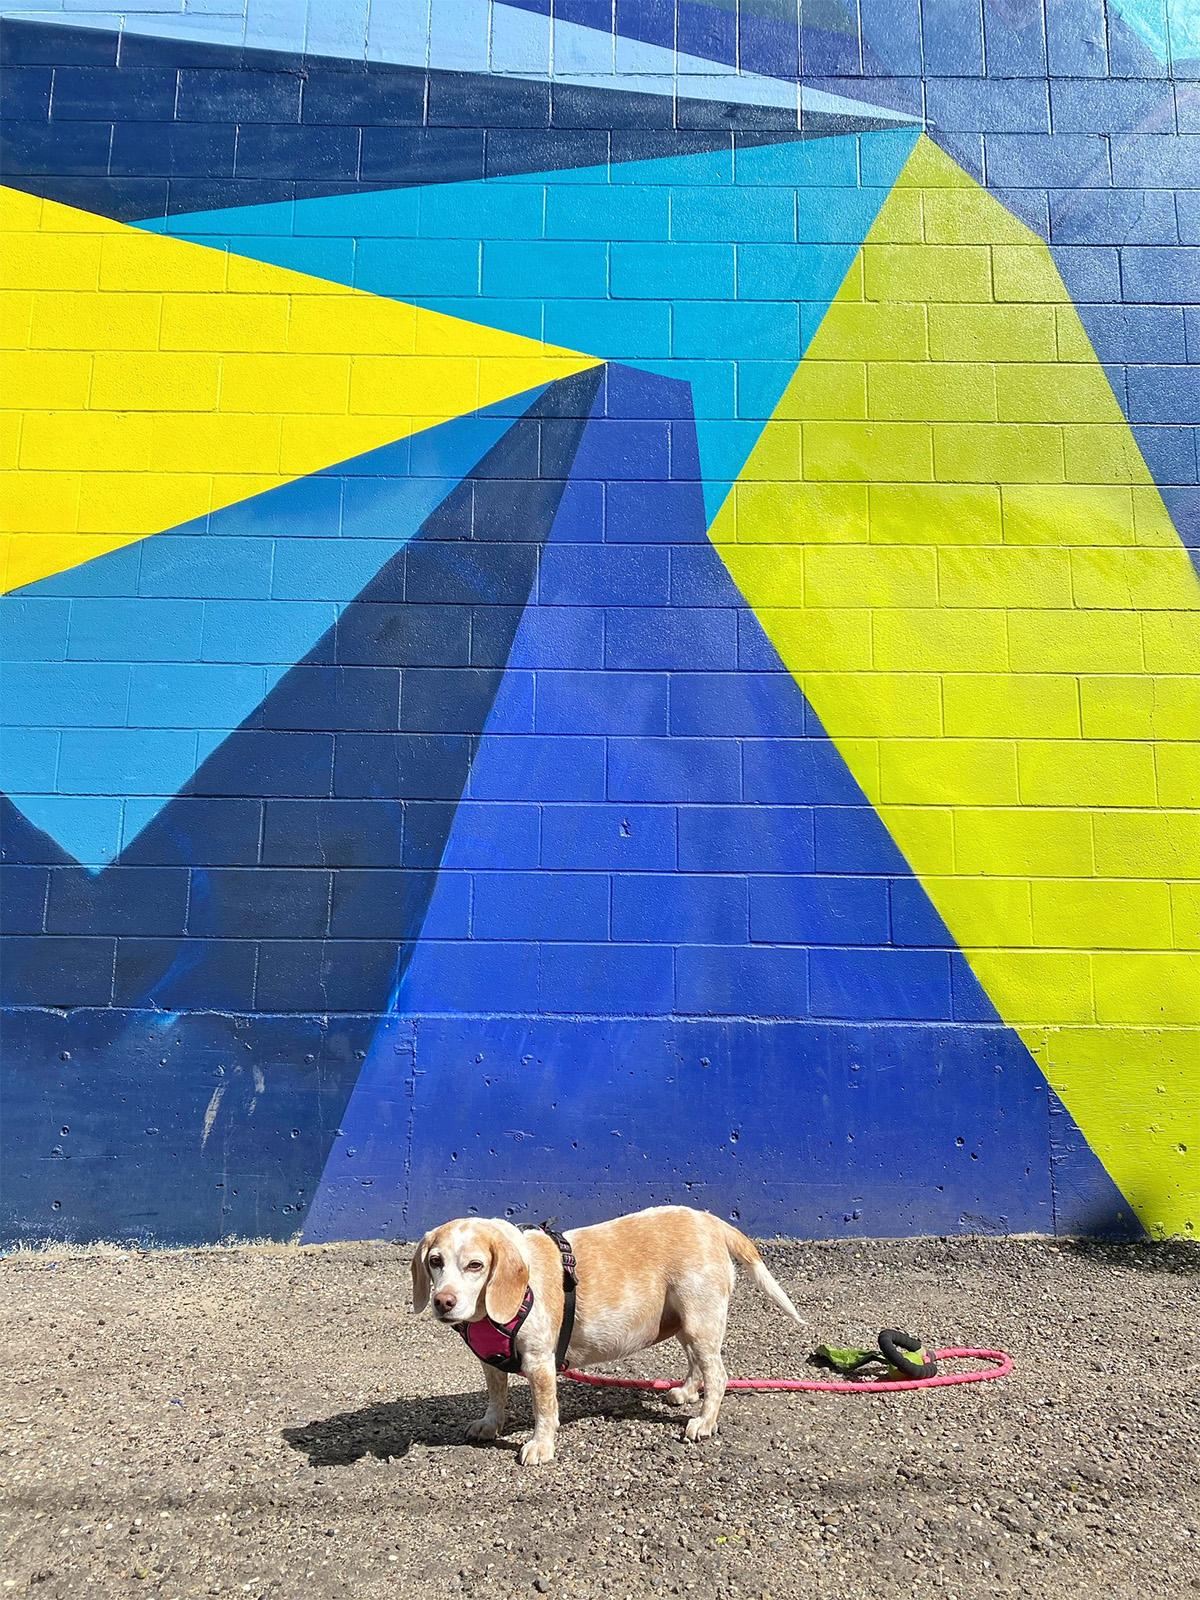 Instagrammable Walls of Edmonton - Explore Edmonton - Murals - Walls - Whyte Ave Old Strathcona - Wane Cod